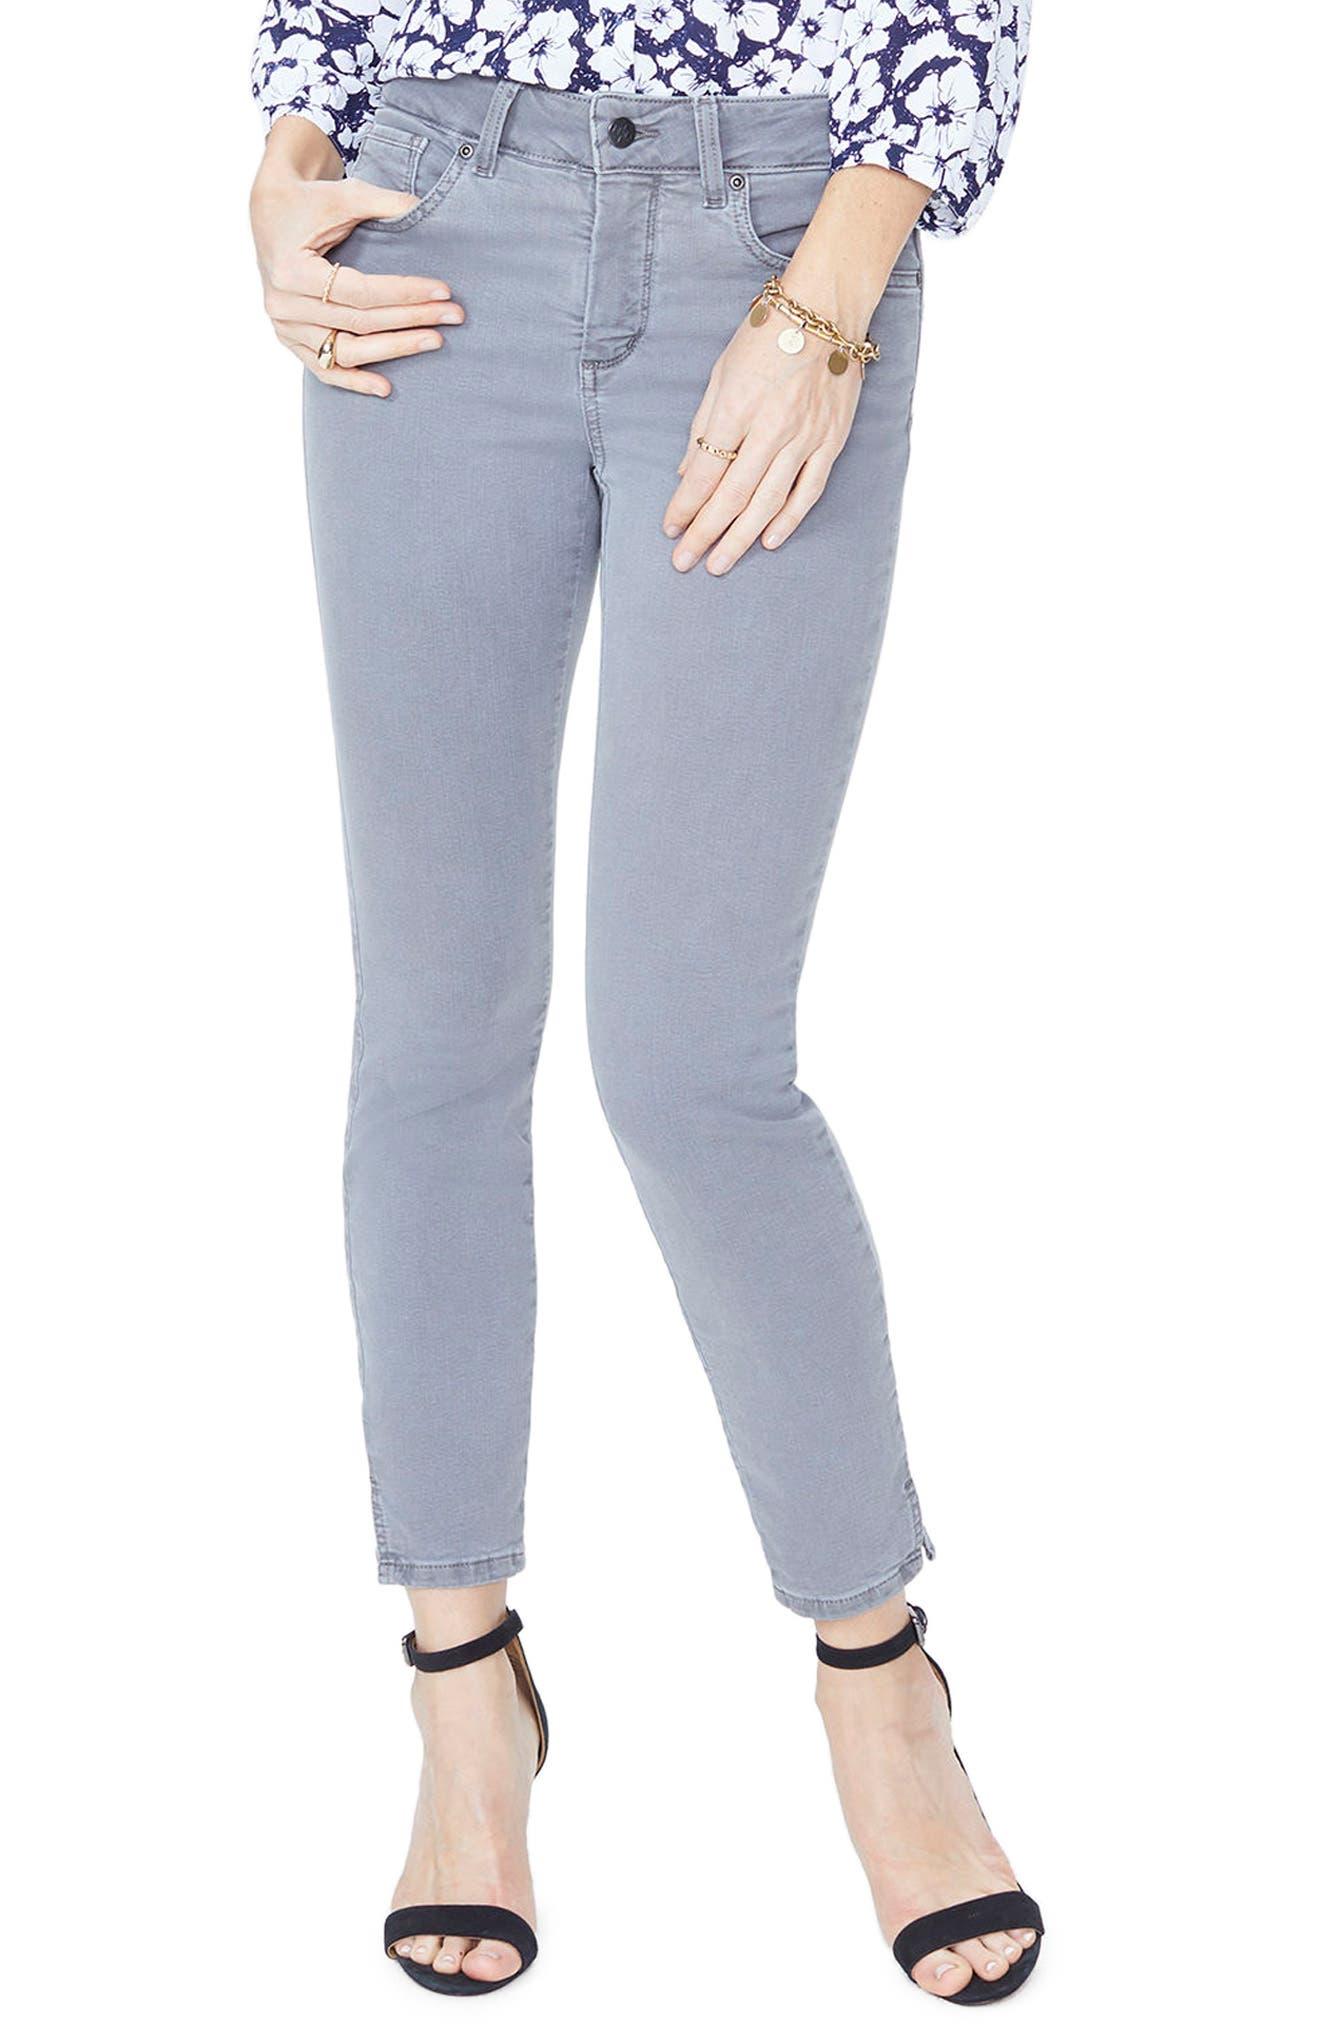 Alternate Image 1 Selected - NYDJ Ami Stretch Ankle Skinny Jeans (Regular & Petite)